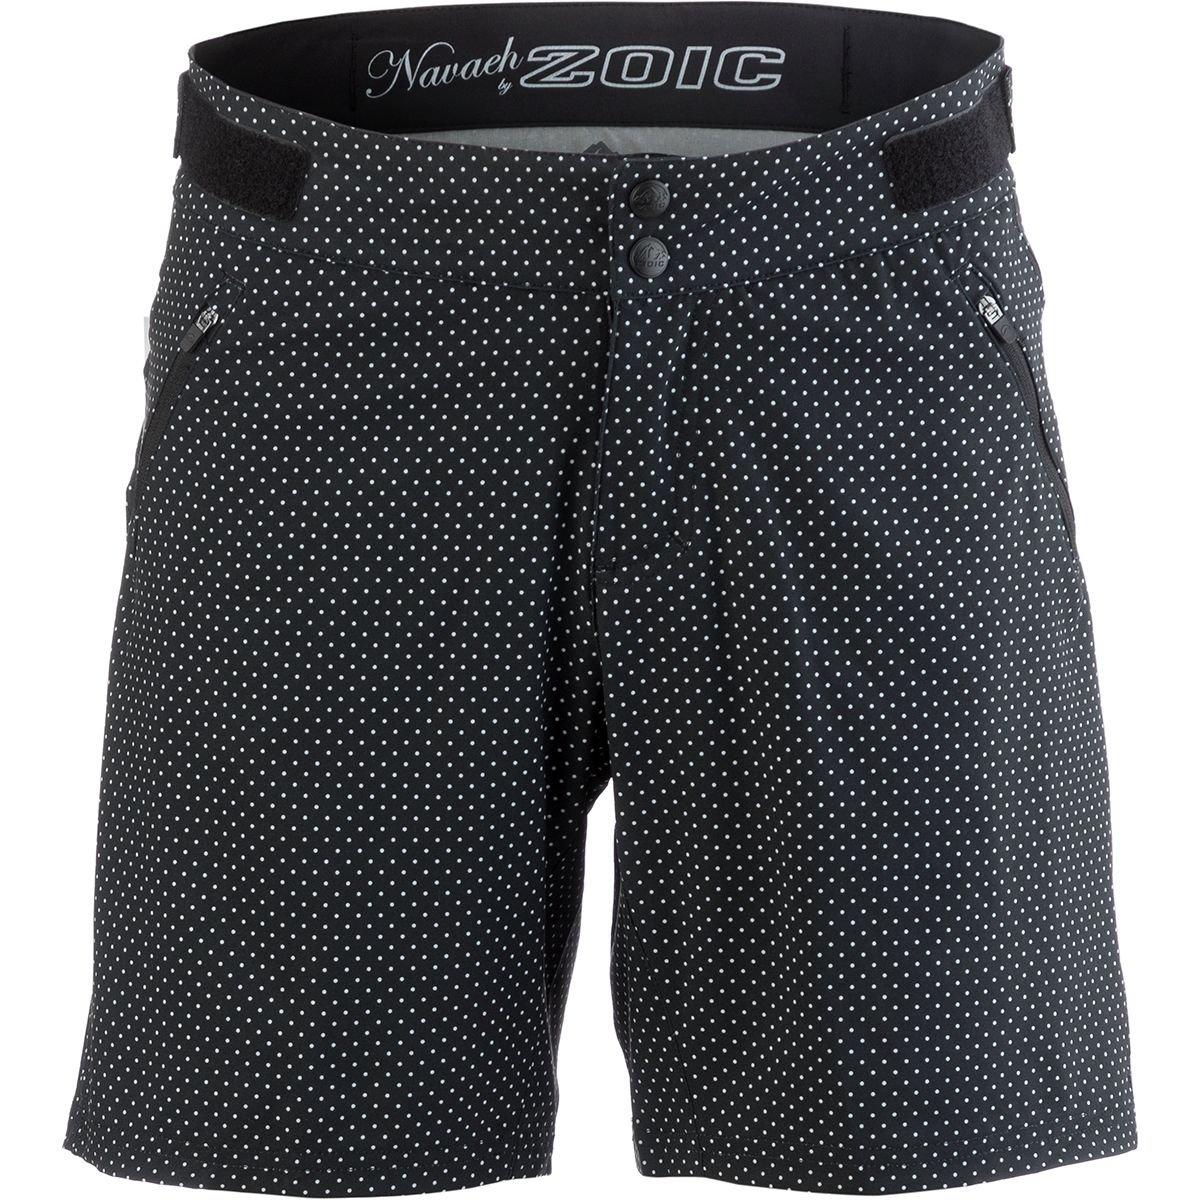 Zoic Navaeh 7 Novelty Bike Short – Women 's B07BHTLRSK Small|ブラック水玉 ブラック水玉 Small